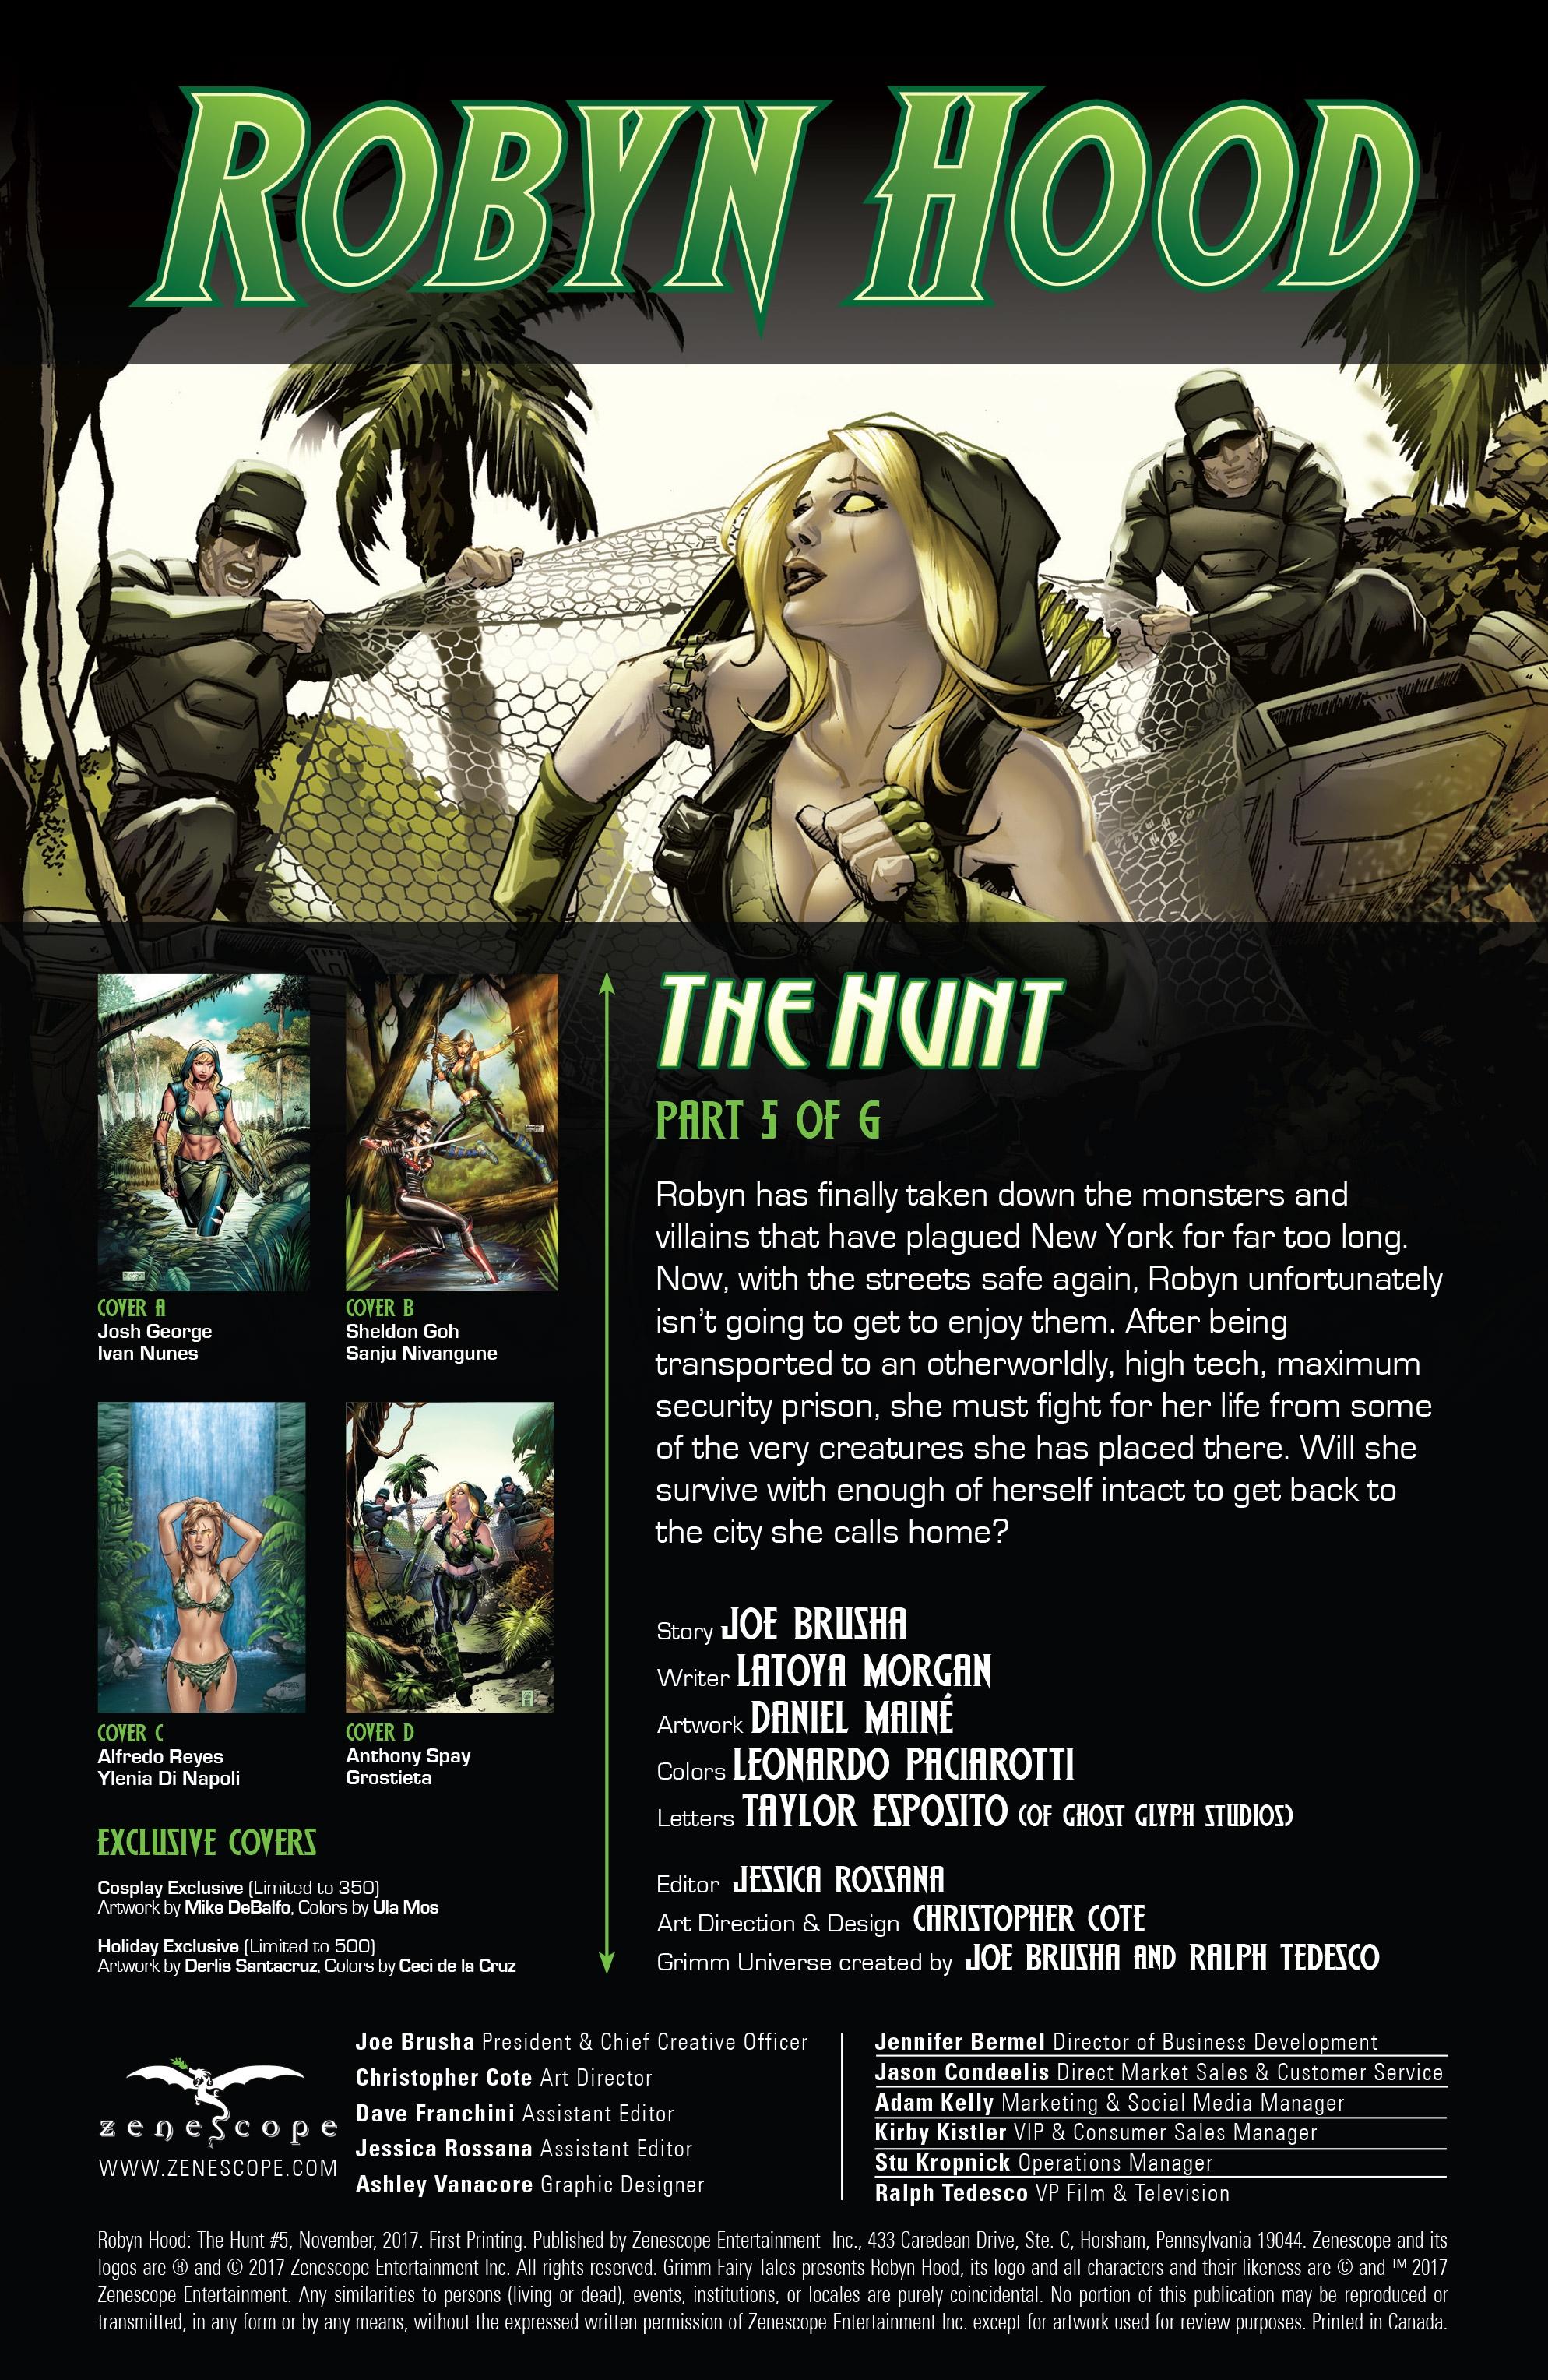 Robyn Hood The Hunt 005 001